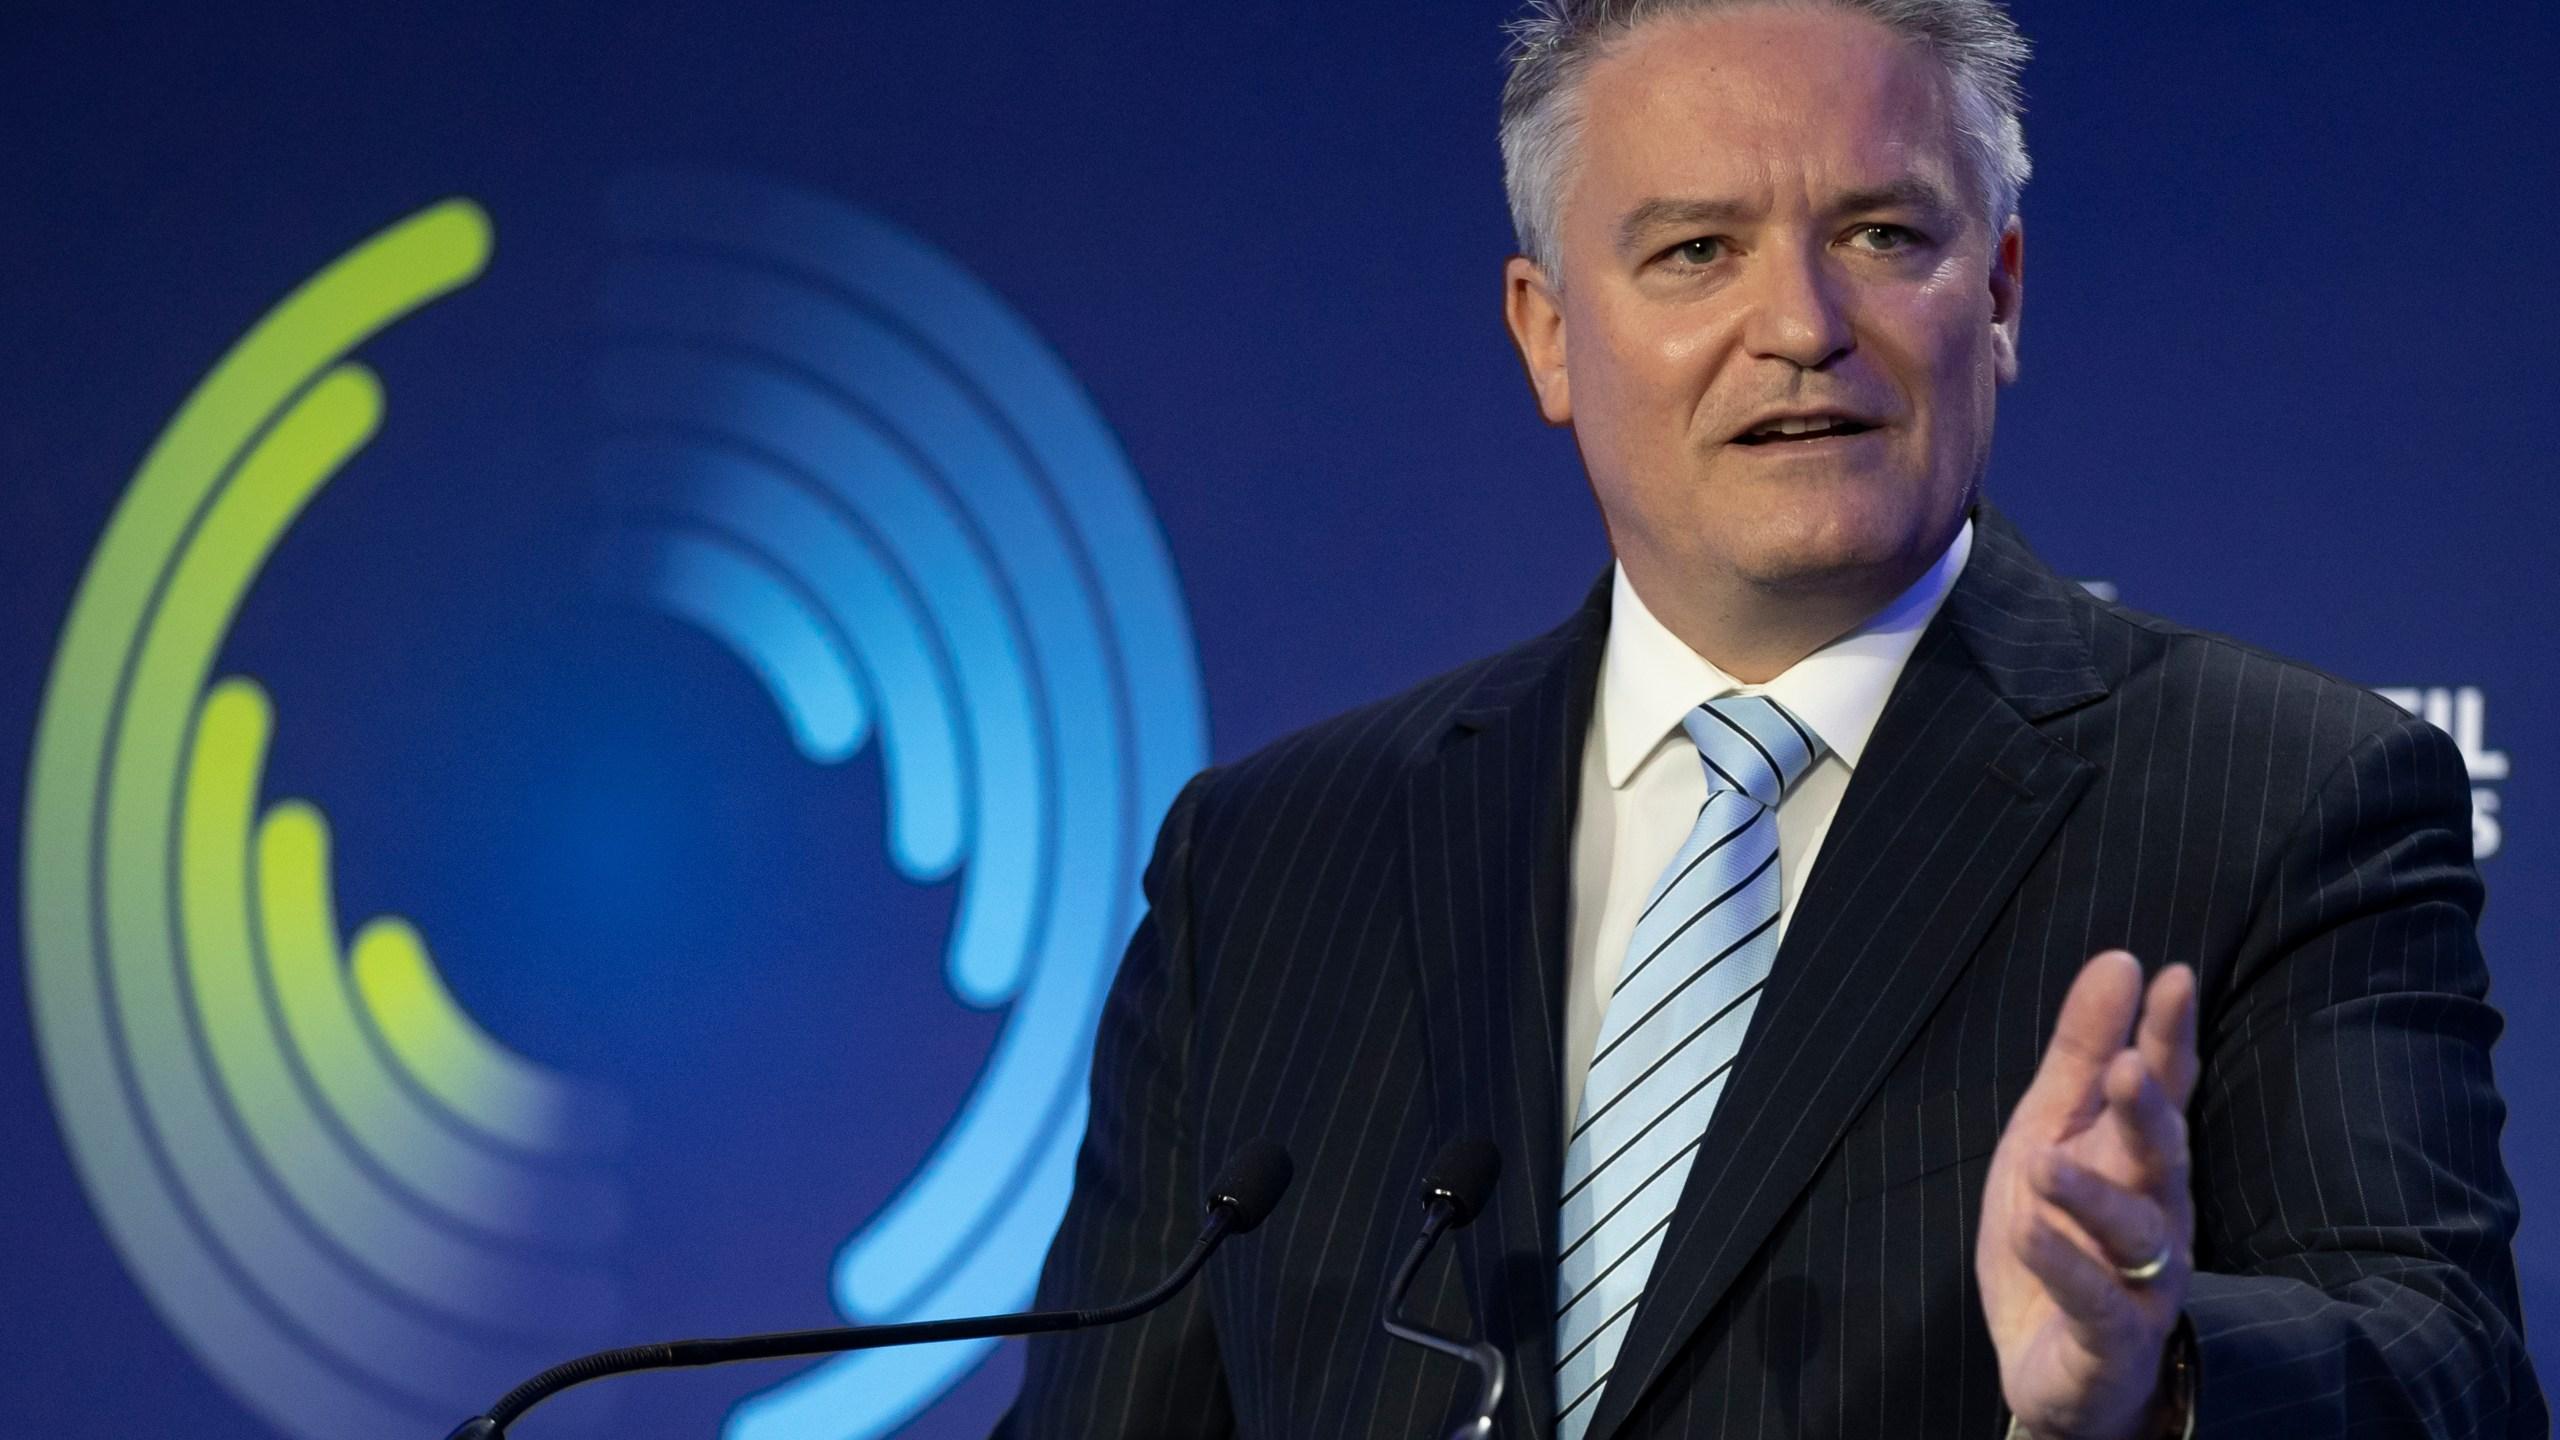 OECD Secretary General Gurria handover ceremony with incoming Secretary General Cormann